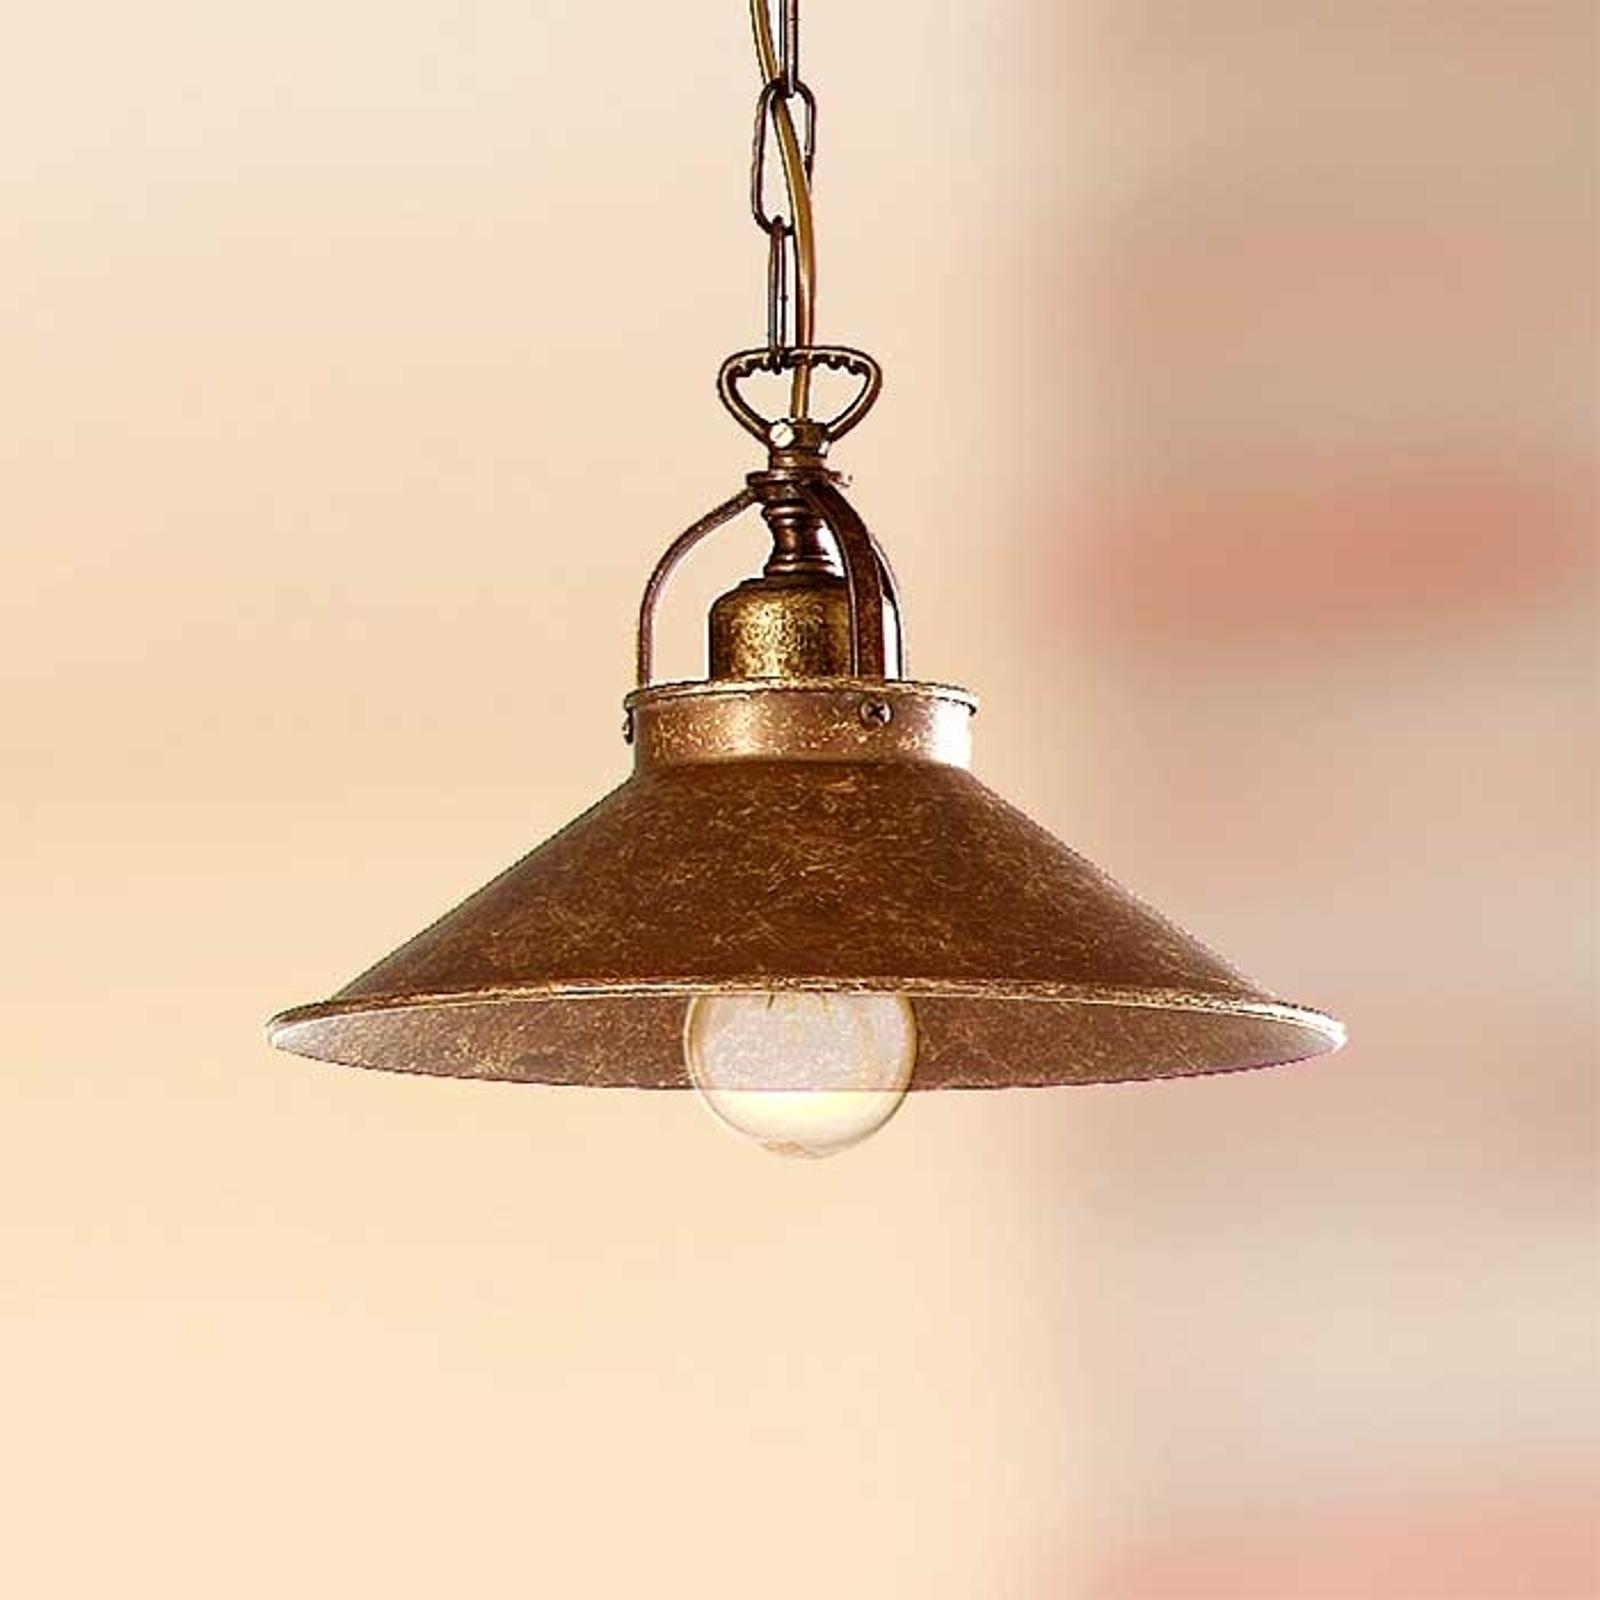 Rustieke hanglamp BRUNO, 25 cm